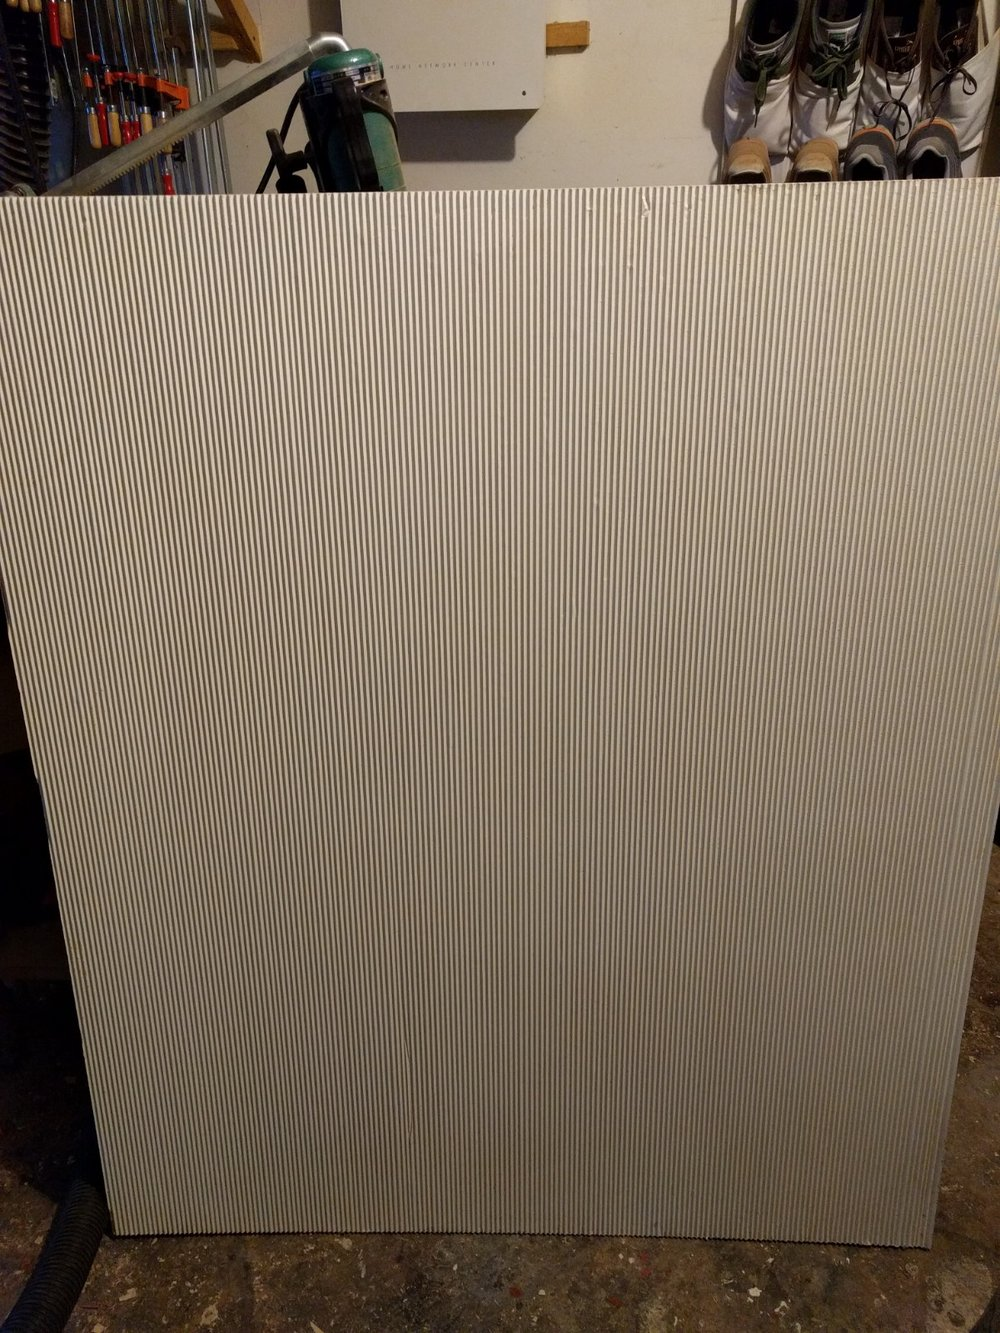 prepped-lenticular-panel-from-mdf.jpg